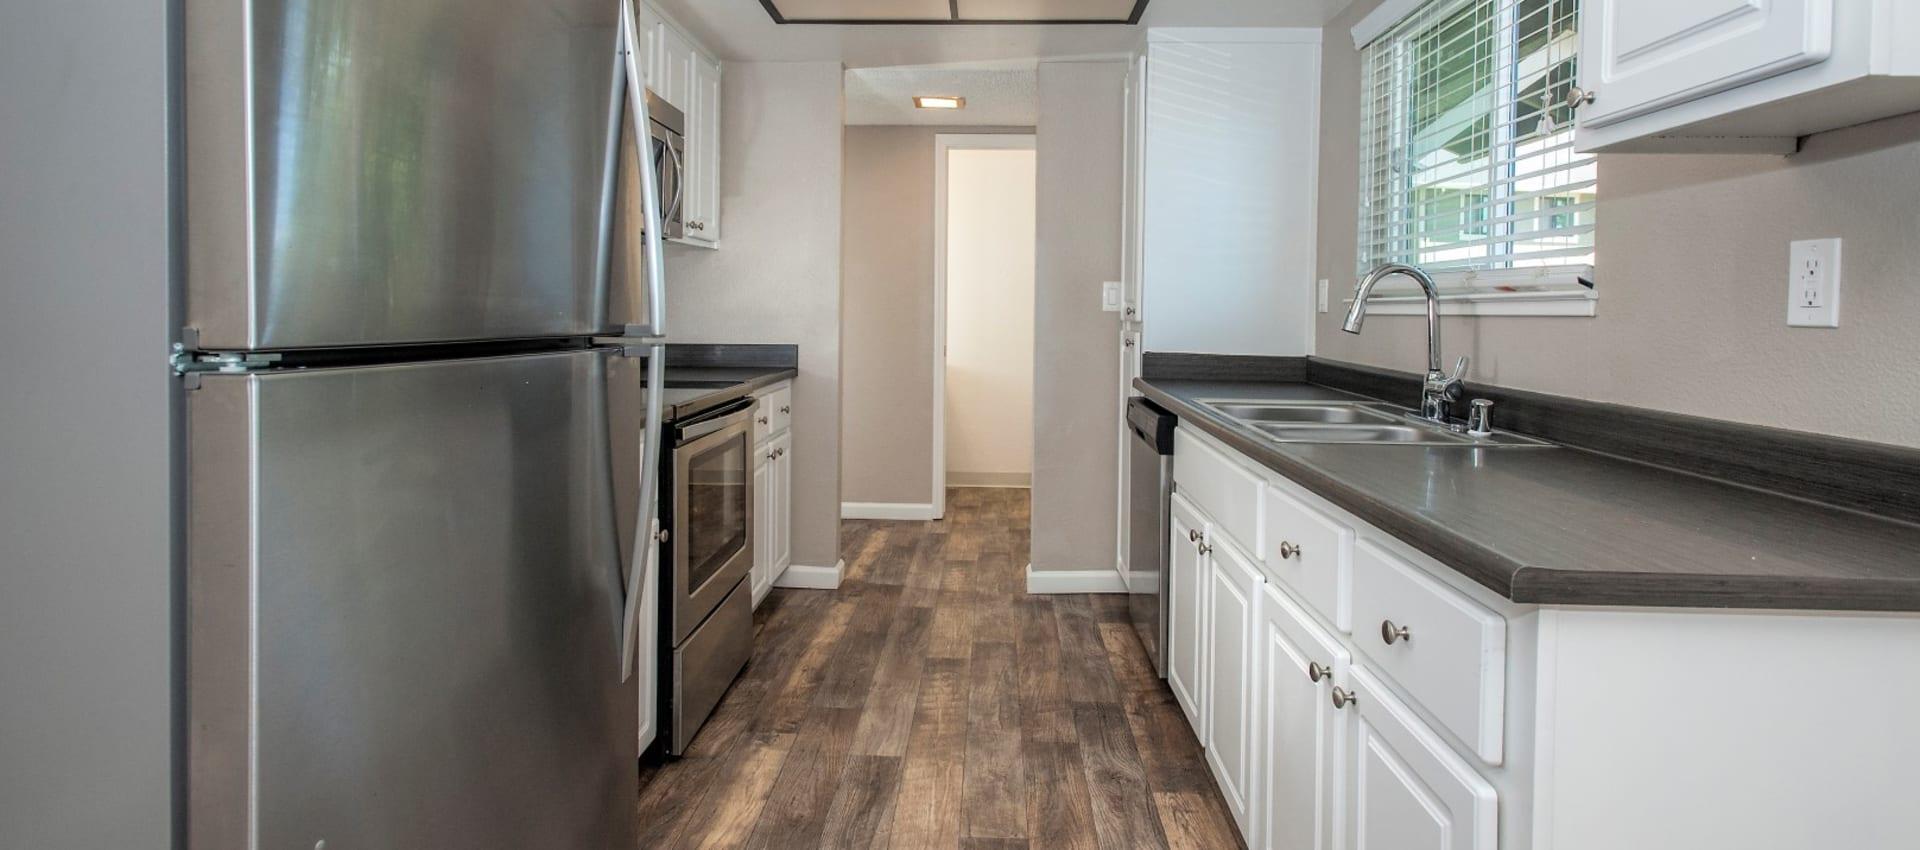 Luxury kitchen at Ridgecrest Apartment Homes in Martinez, California